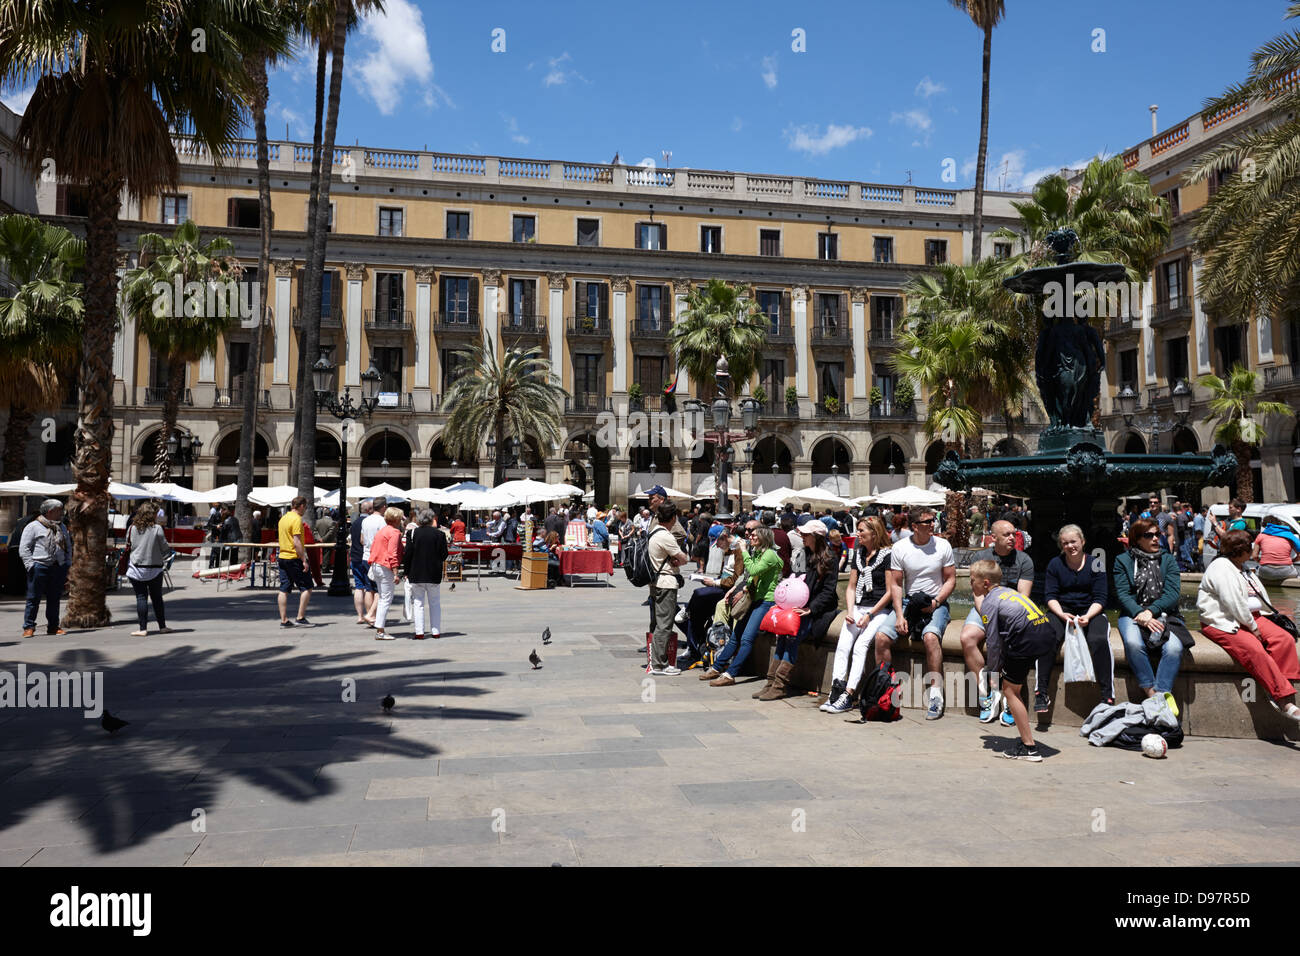 placa reial barcelona catalonia spain - Stock Image